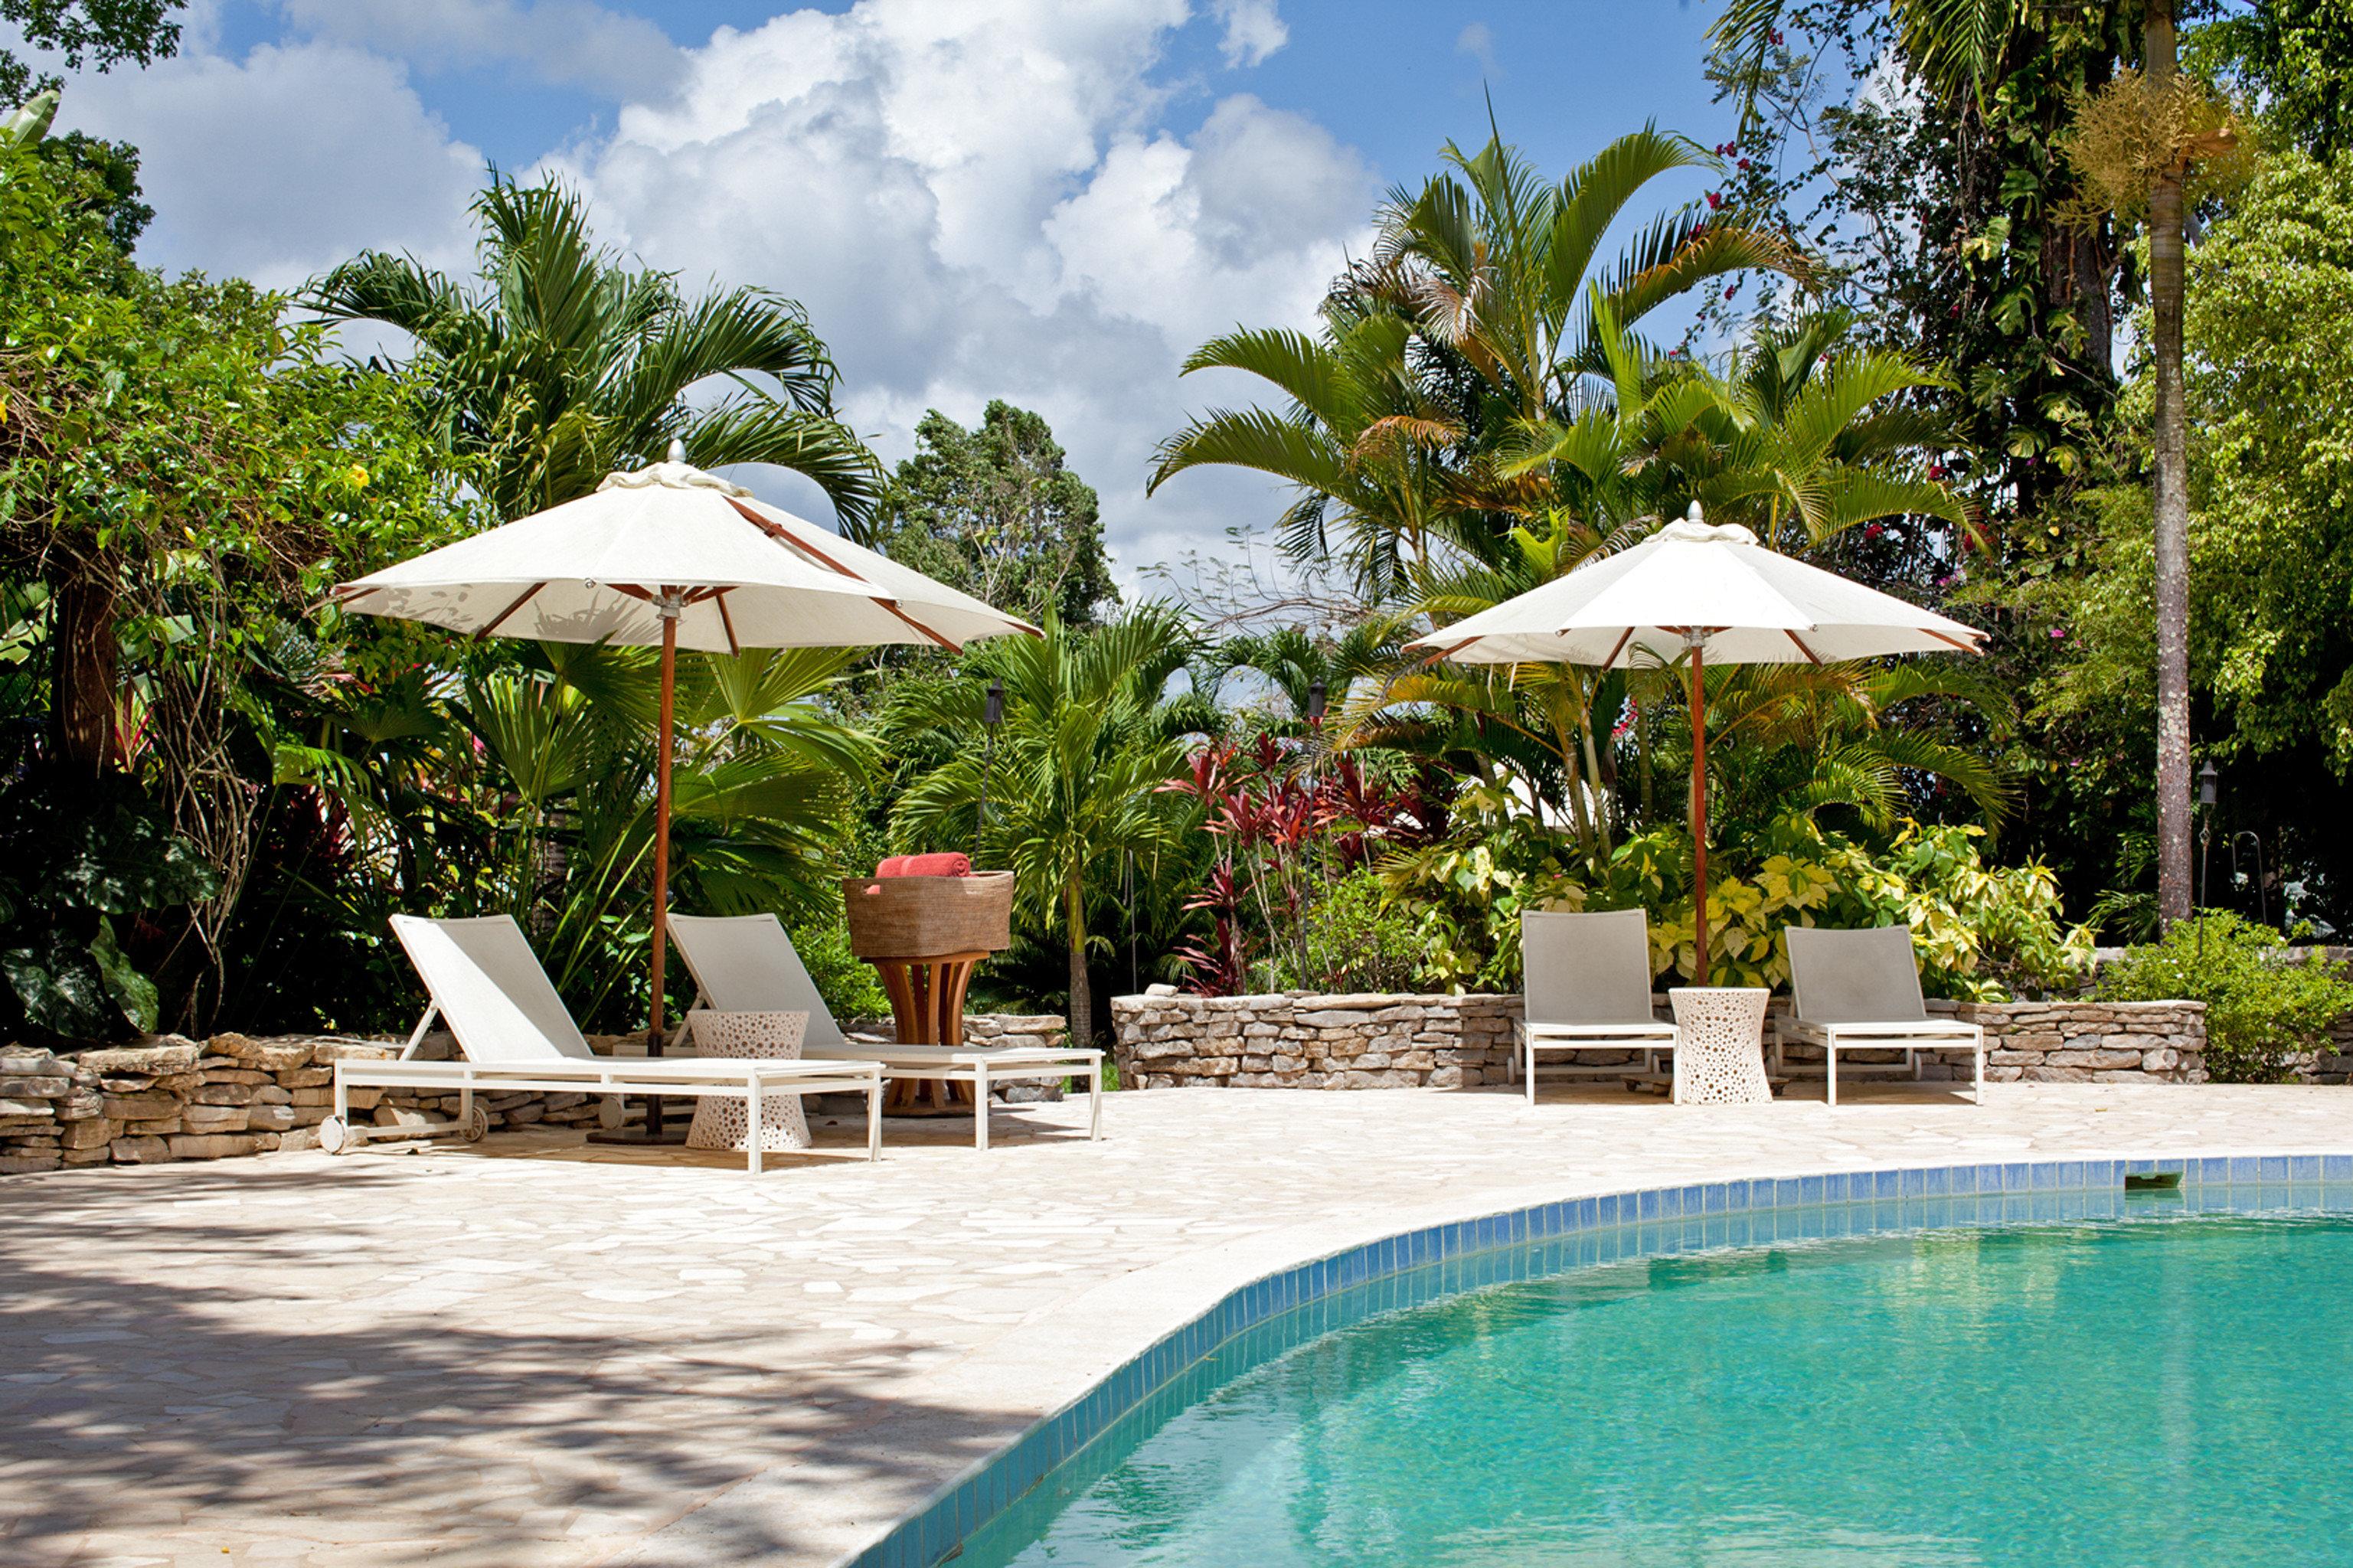 Lodge tree umbrella Resort Pool chair swimming pool building leisure swimming lawn green Villa caribbean backyard Dining Village shade lined